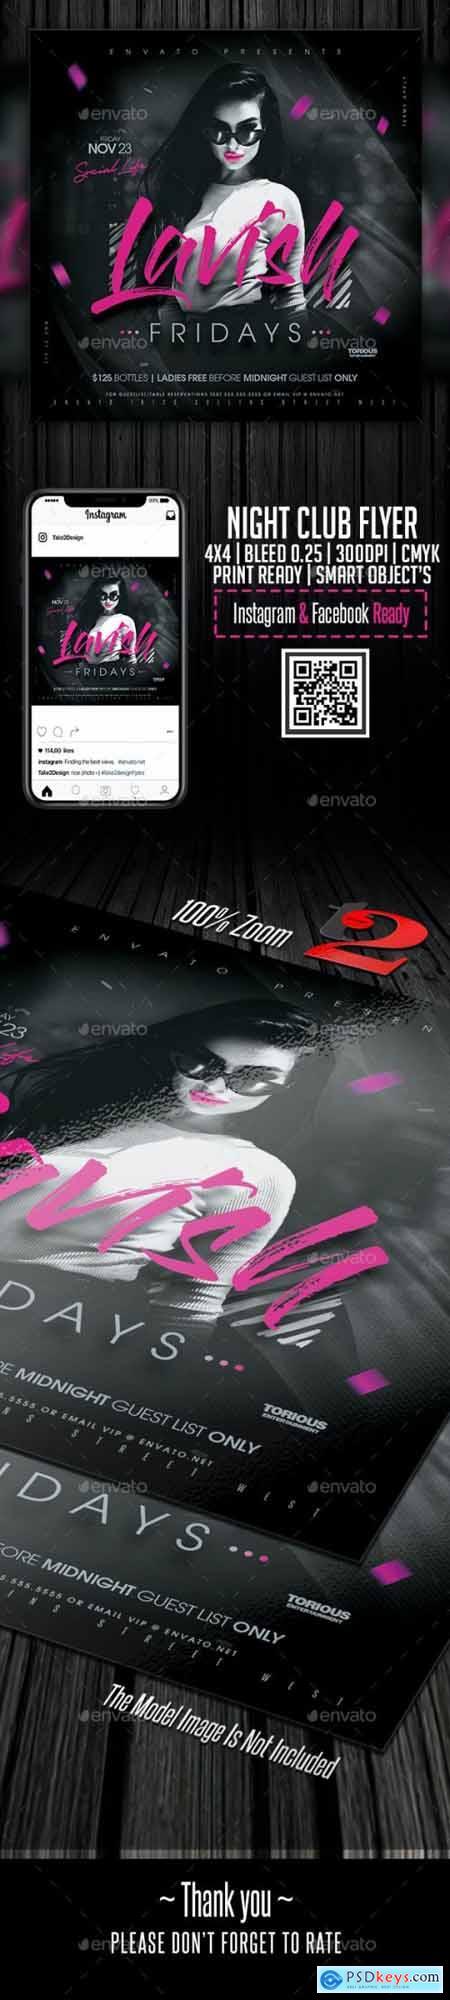 Night Club Flyer Template 24274527